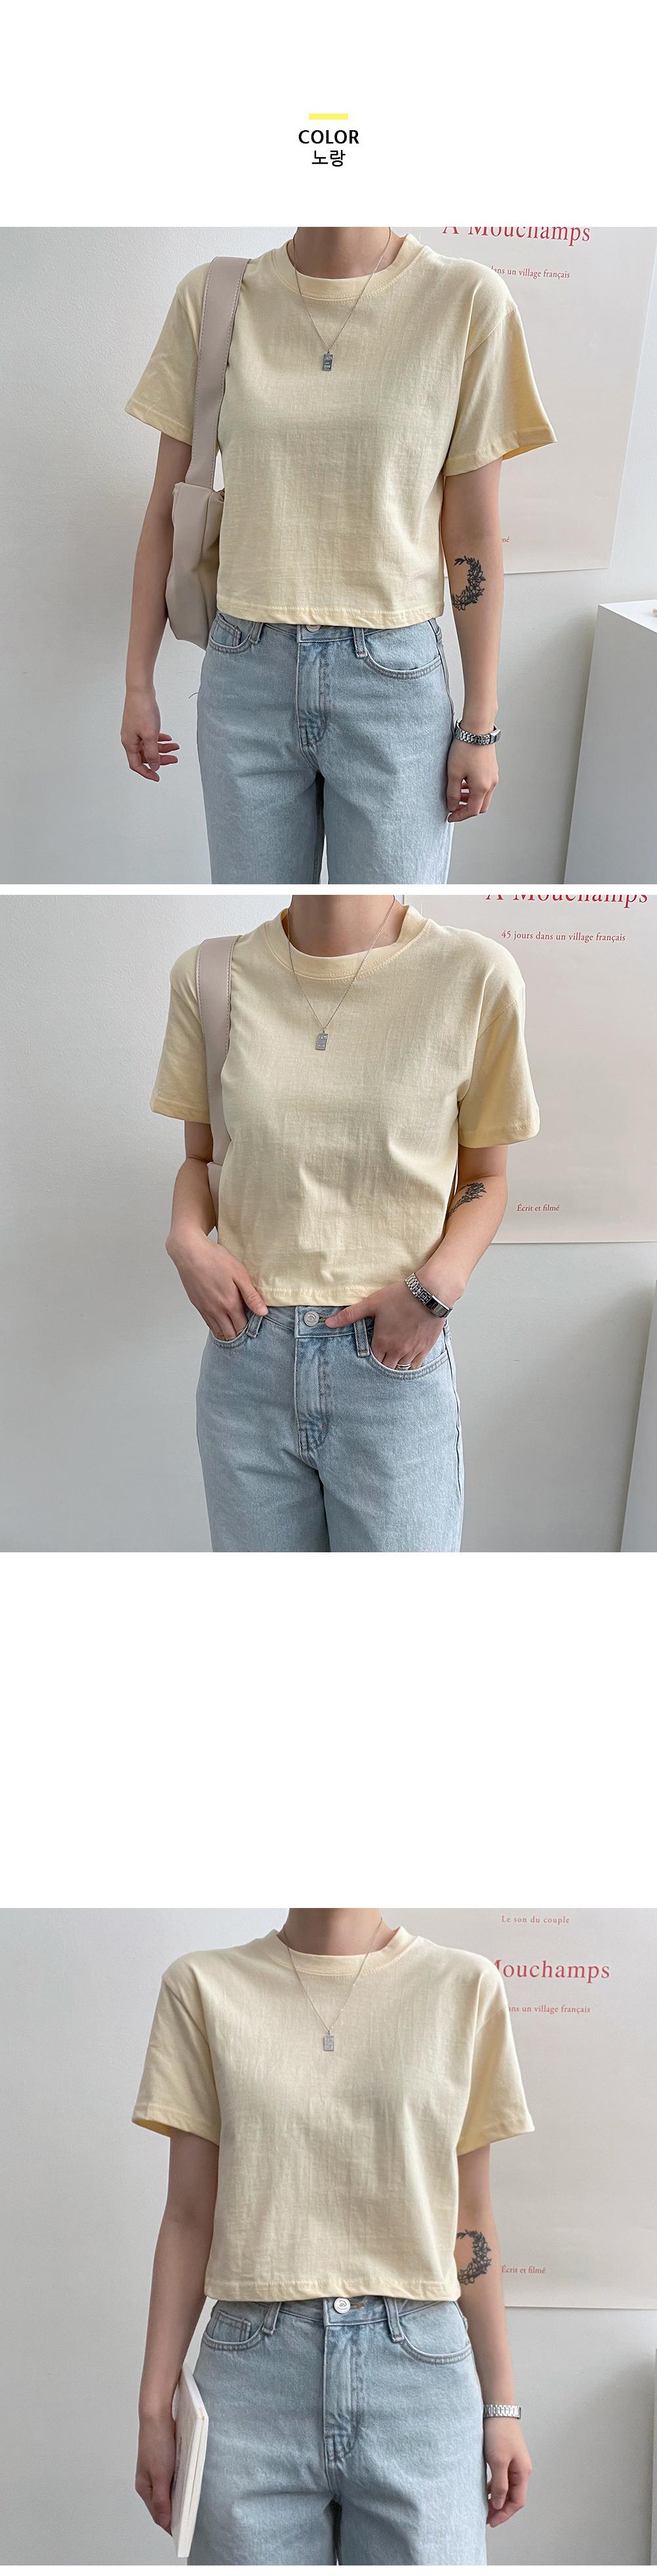 dress model image-S1L17